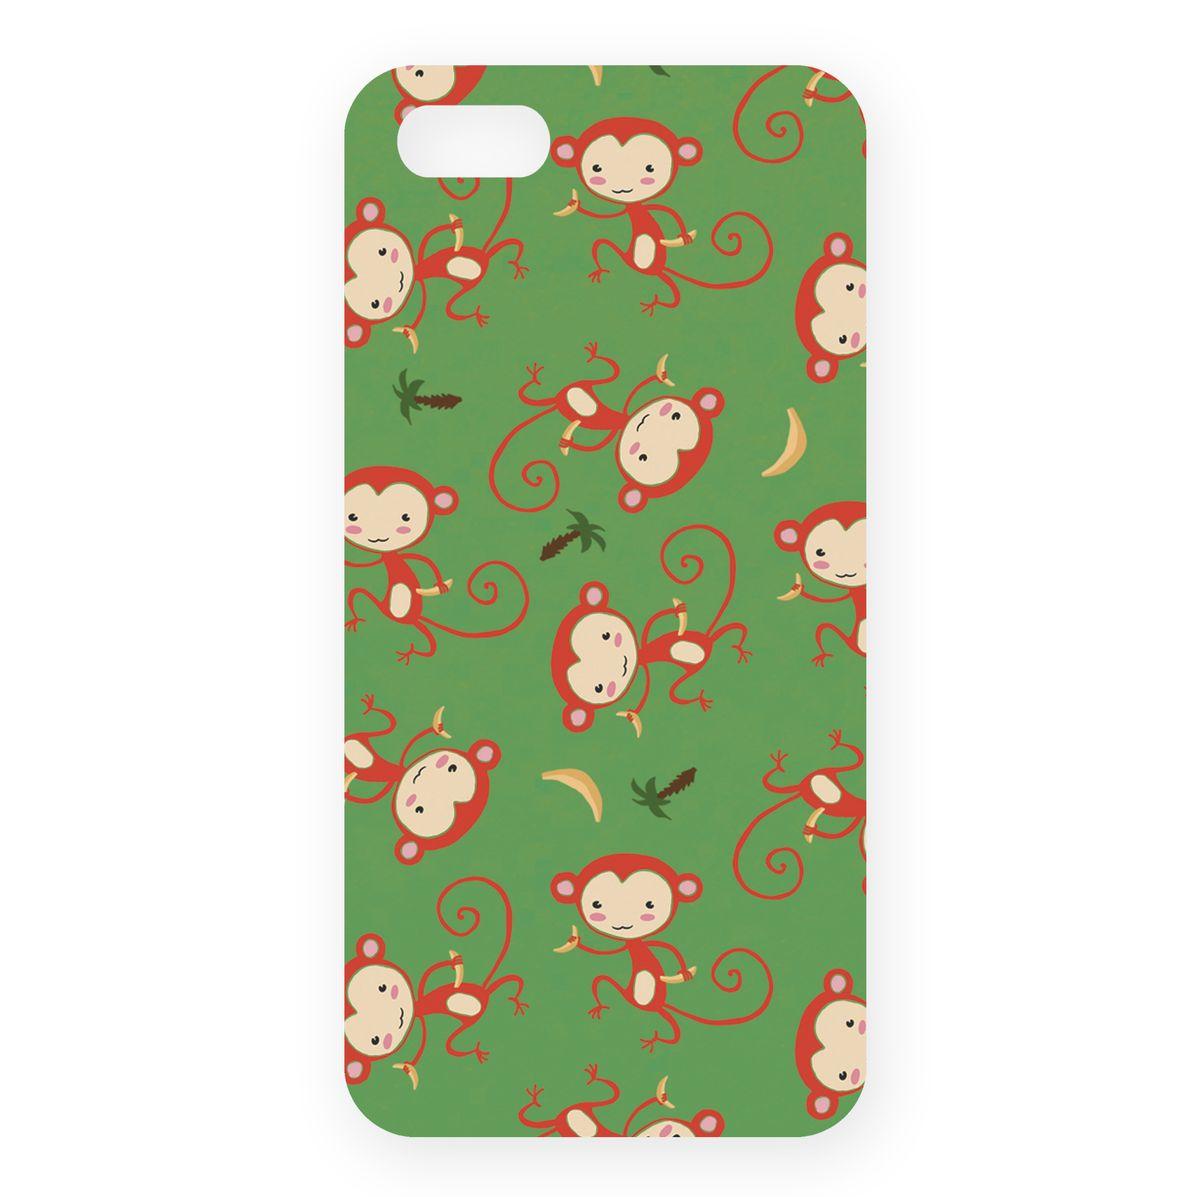 Mitya Veselkov Красные обезьянки на зеленом чехол для Apple iPhone 5/5s